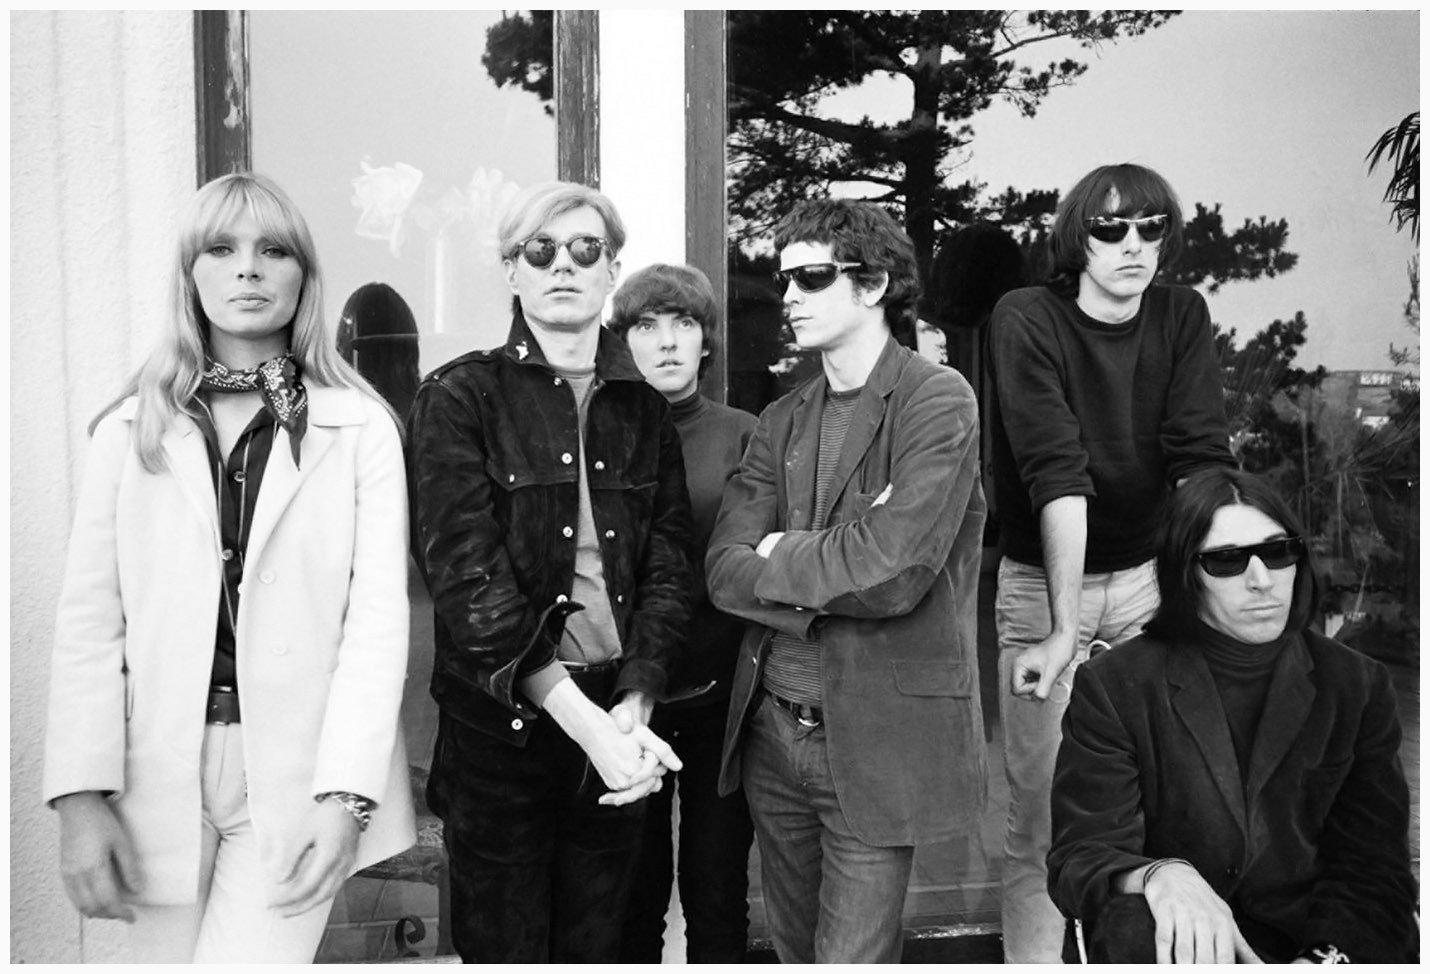 The Velvet Underground & Nico at 50: Monumental album or